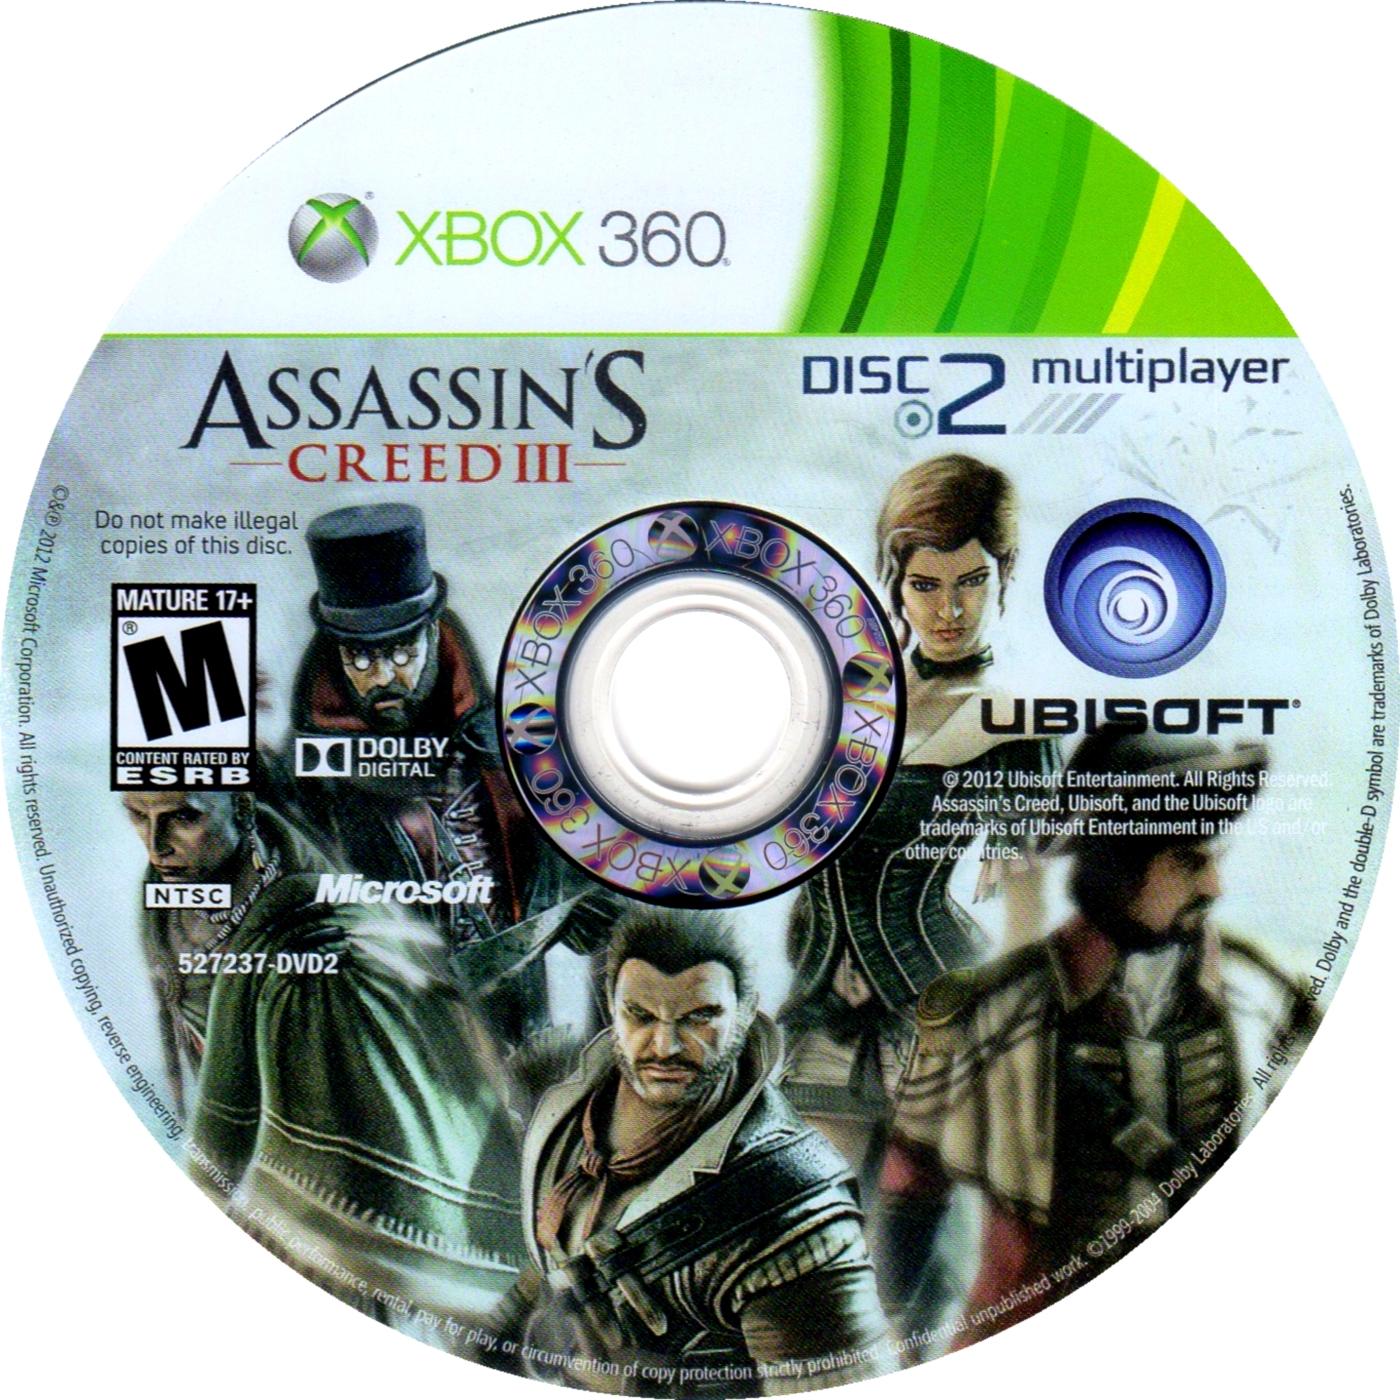 Label Assassins Creed III Disc 2 Xbox 360